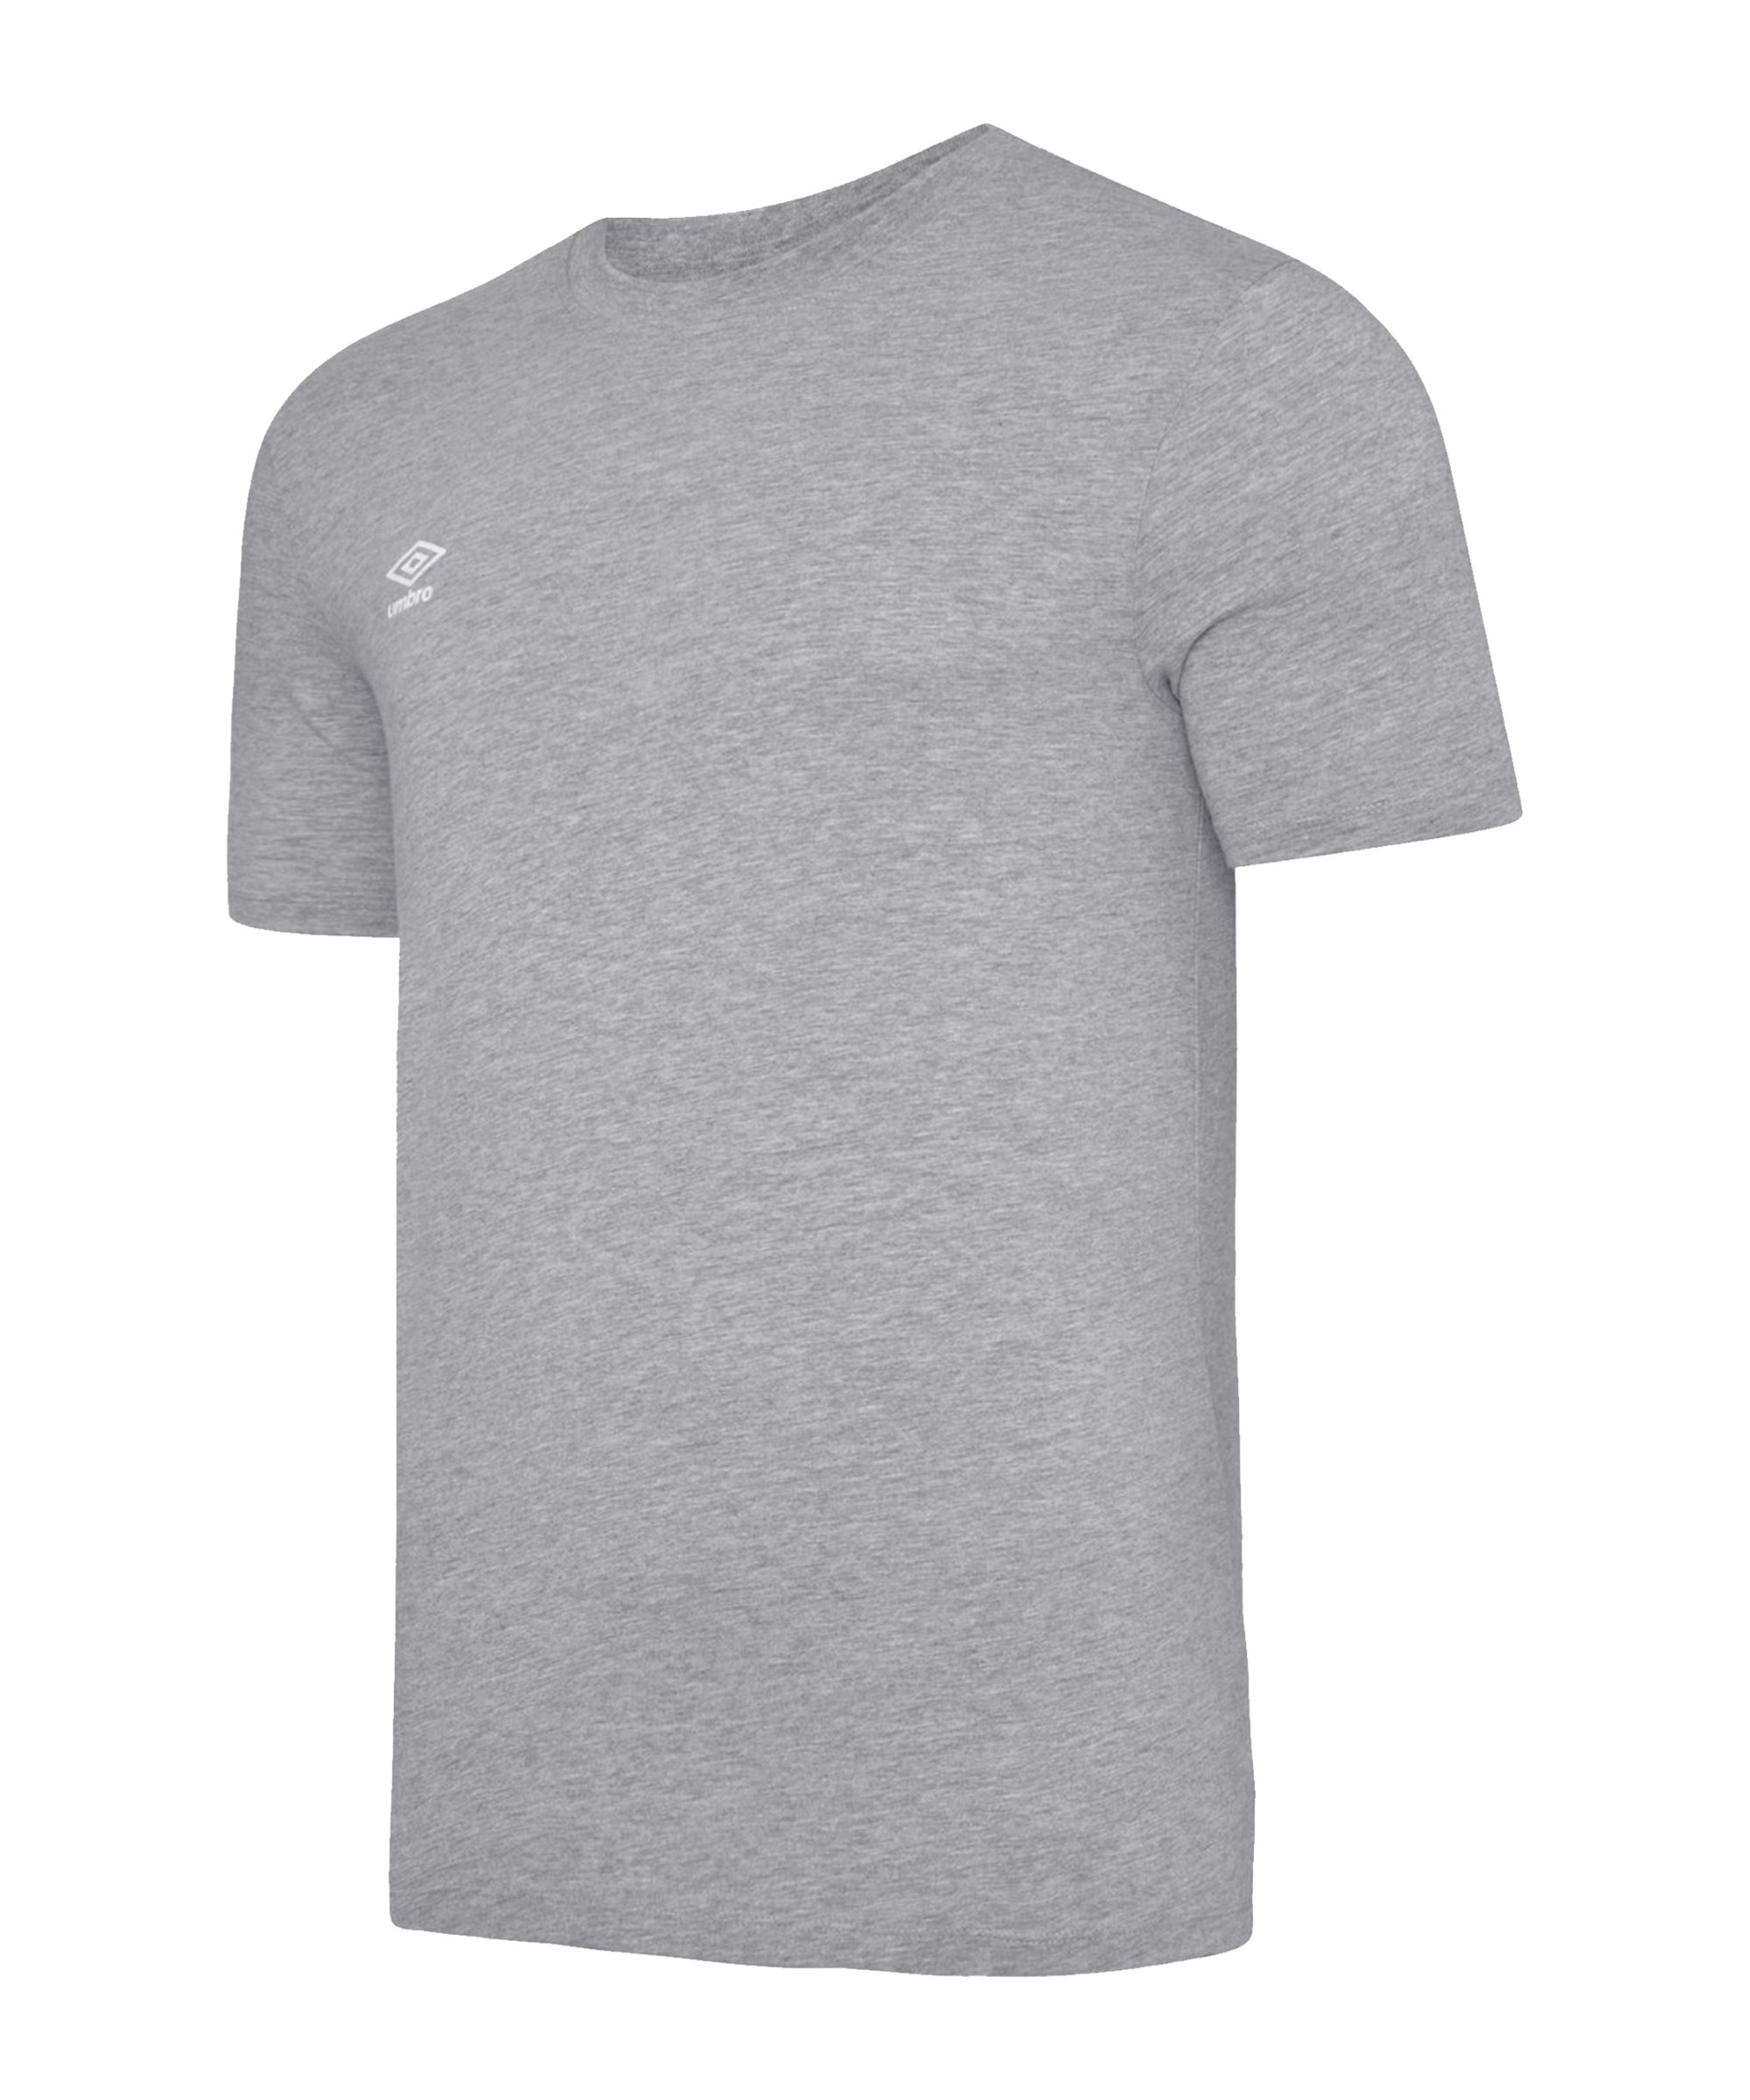 Umbro Club Leisure Crew Tee T-Shirt F2NW - blau